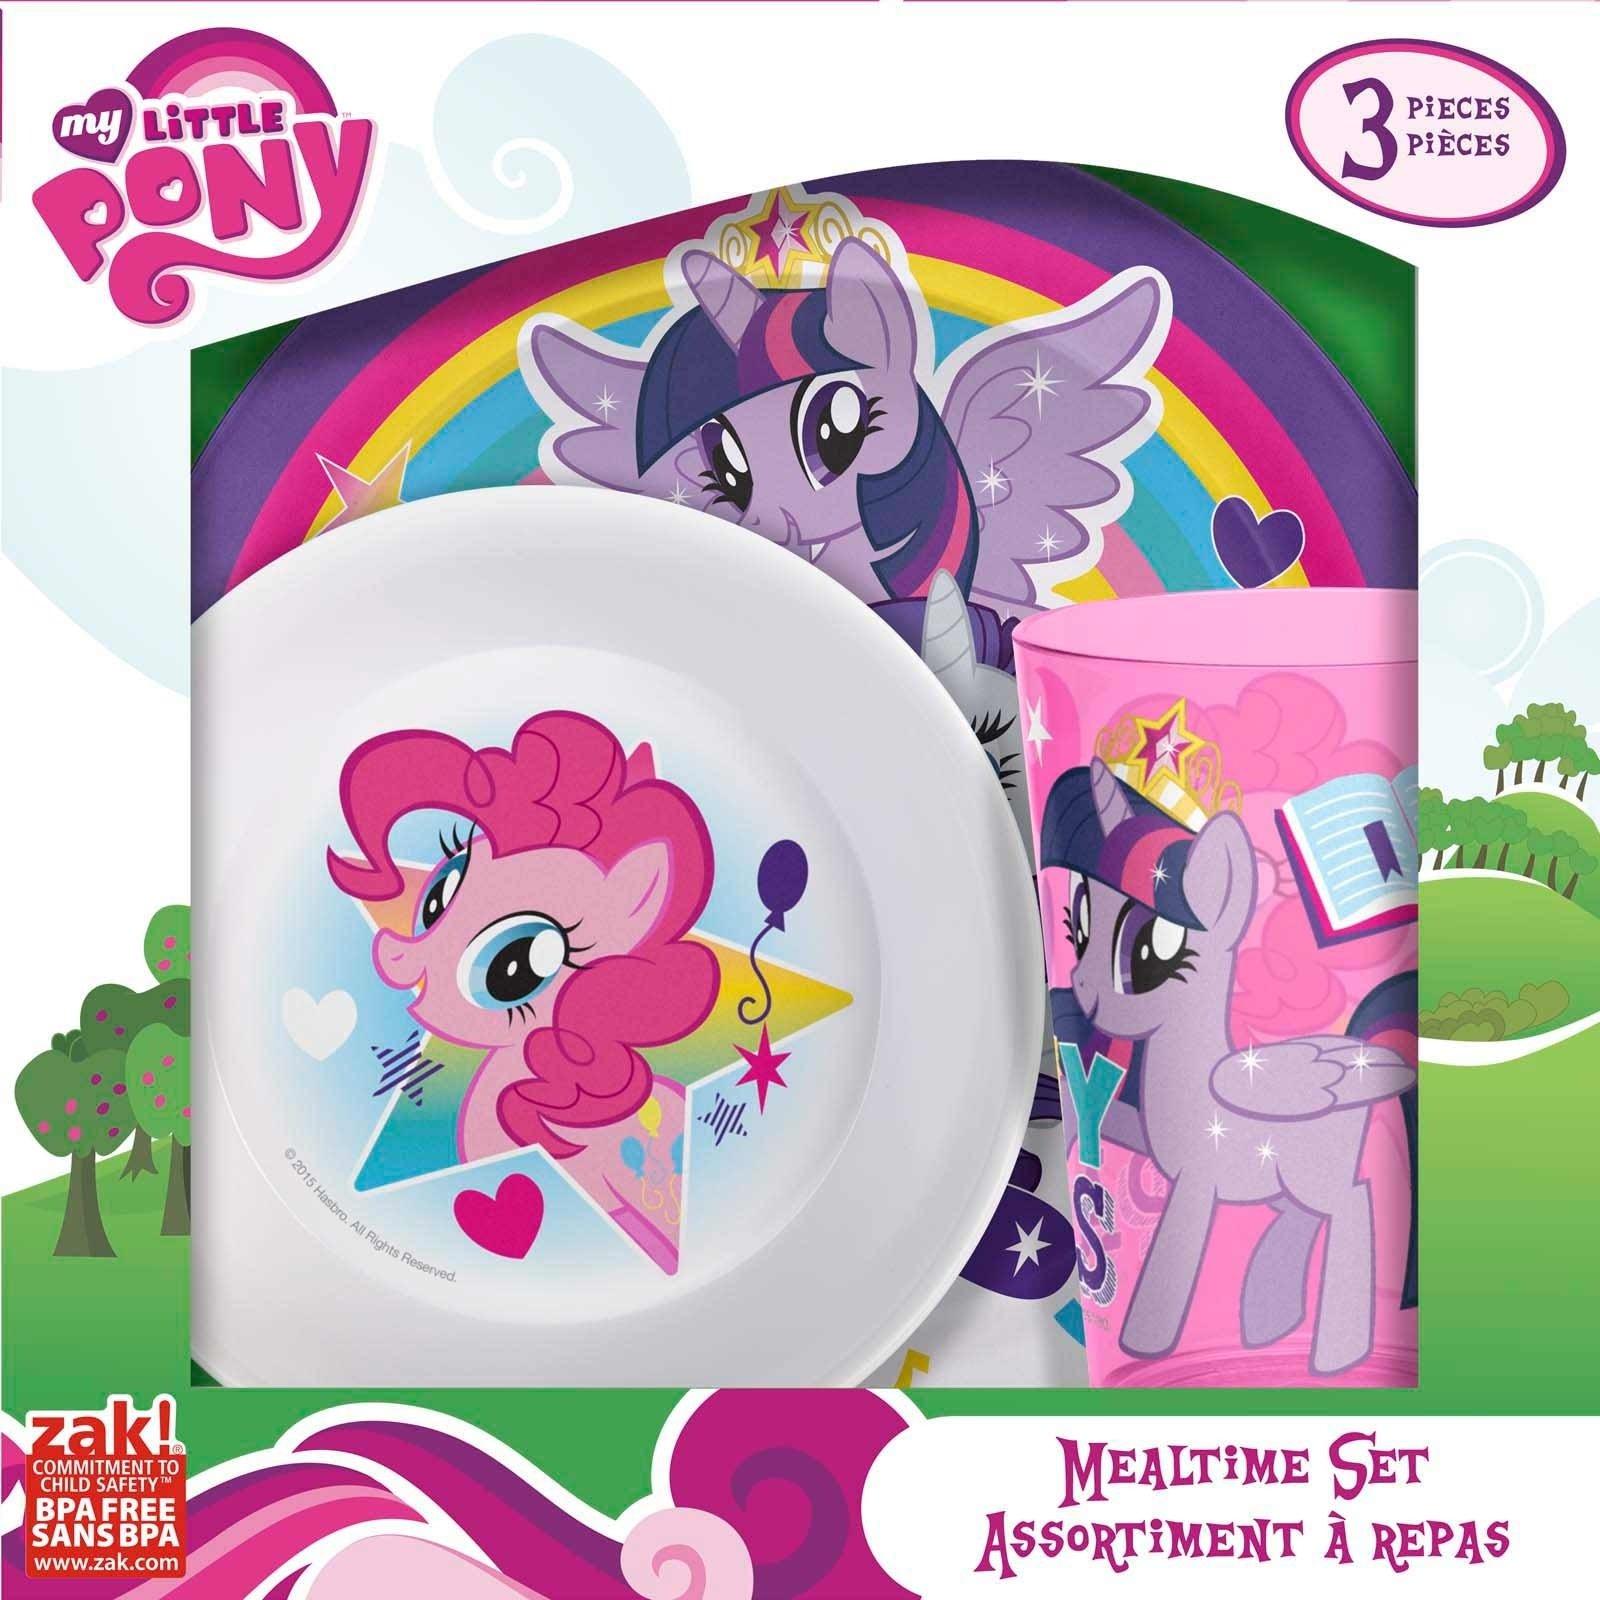 10 Gorgeous My Little Pony Gift Ideas my little pony kids dinnerware set for sale tv series zak zak